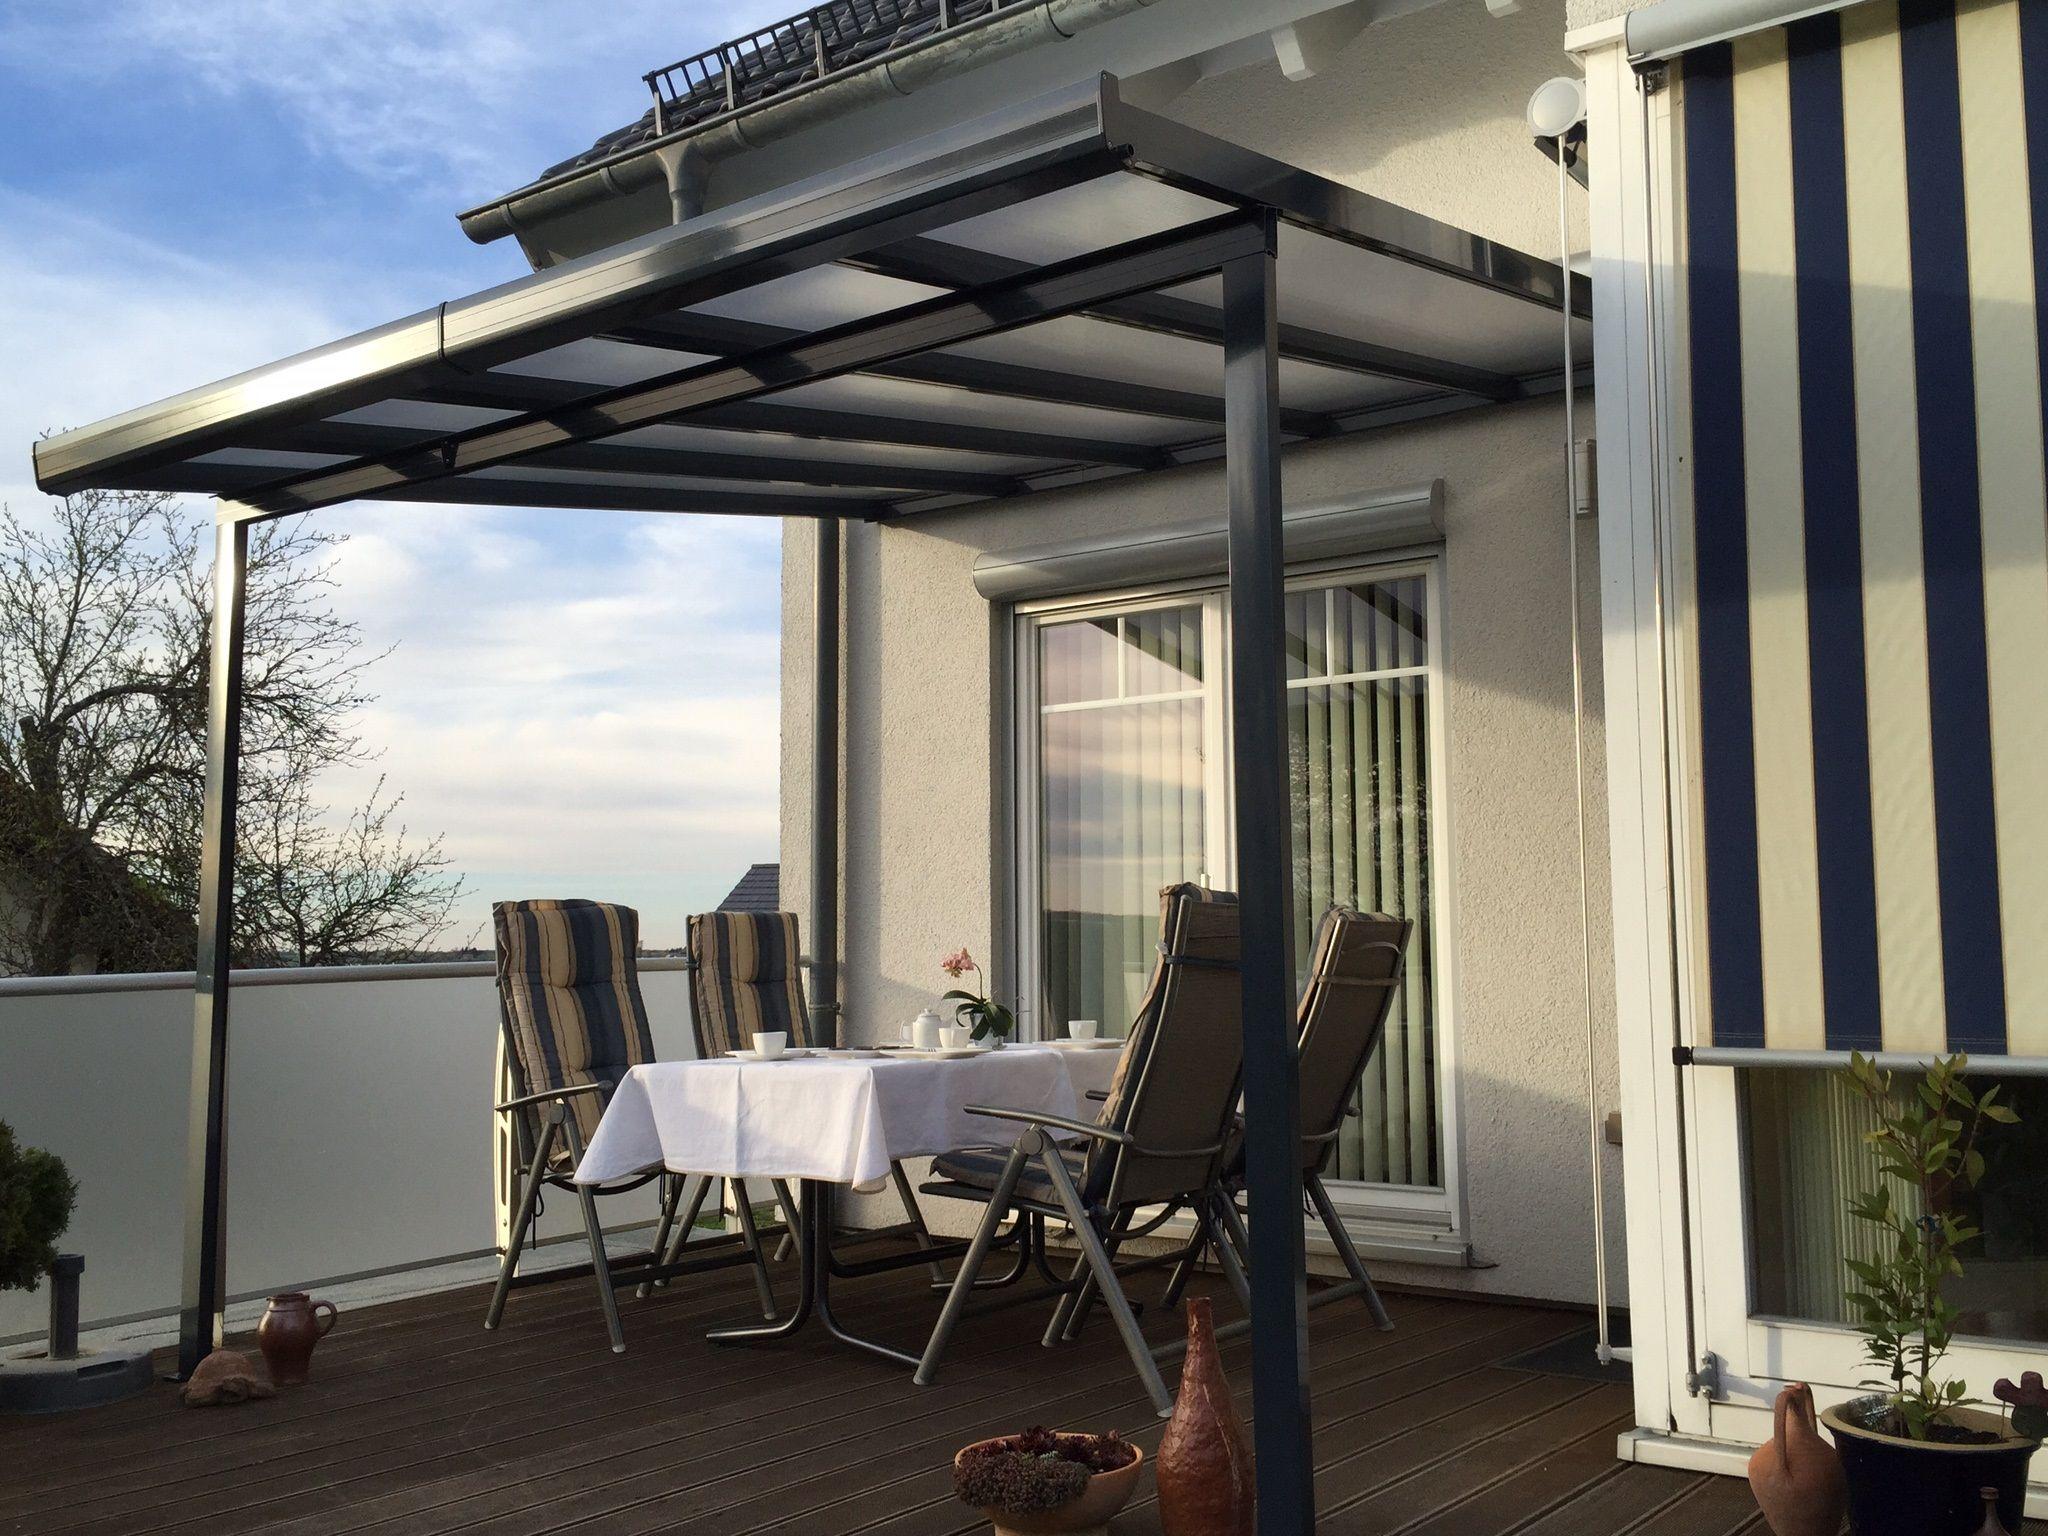 25 sch ne terrassendach bausatz ideen auf pinterest pergola bausatz balkonschirm rechteckig. Black Bedroom Furniture Sets. Home Design Ideas